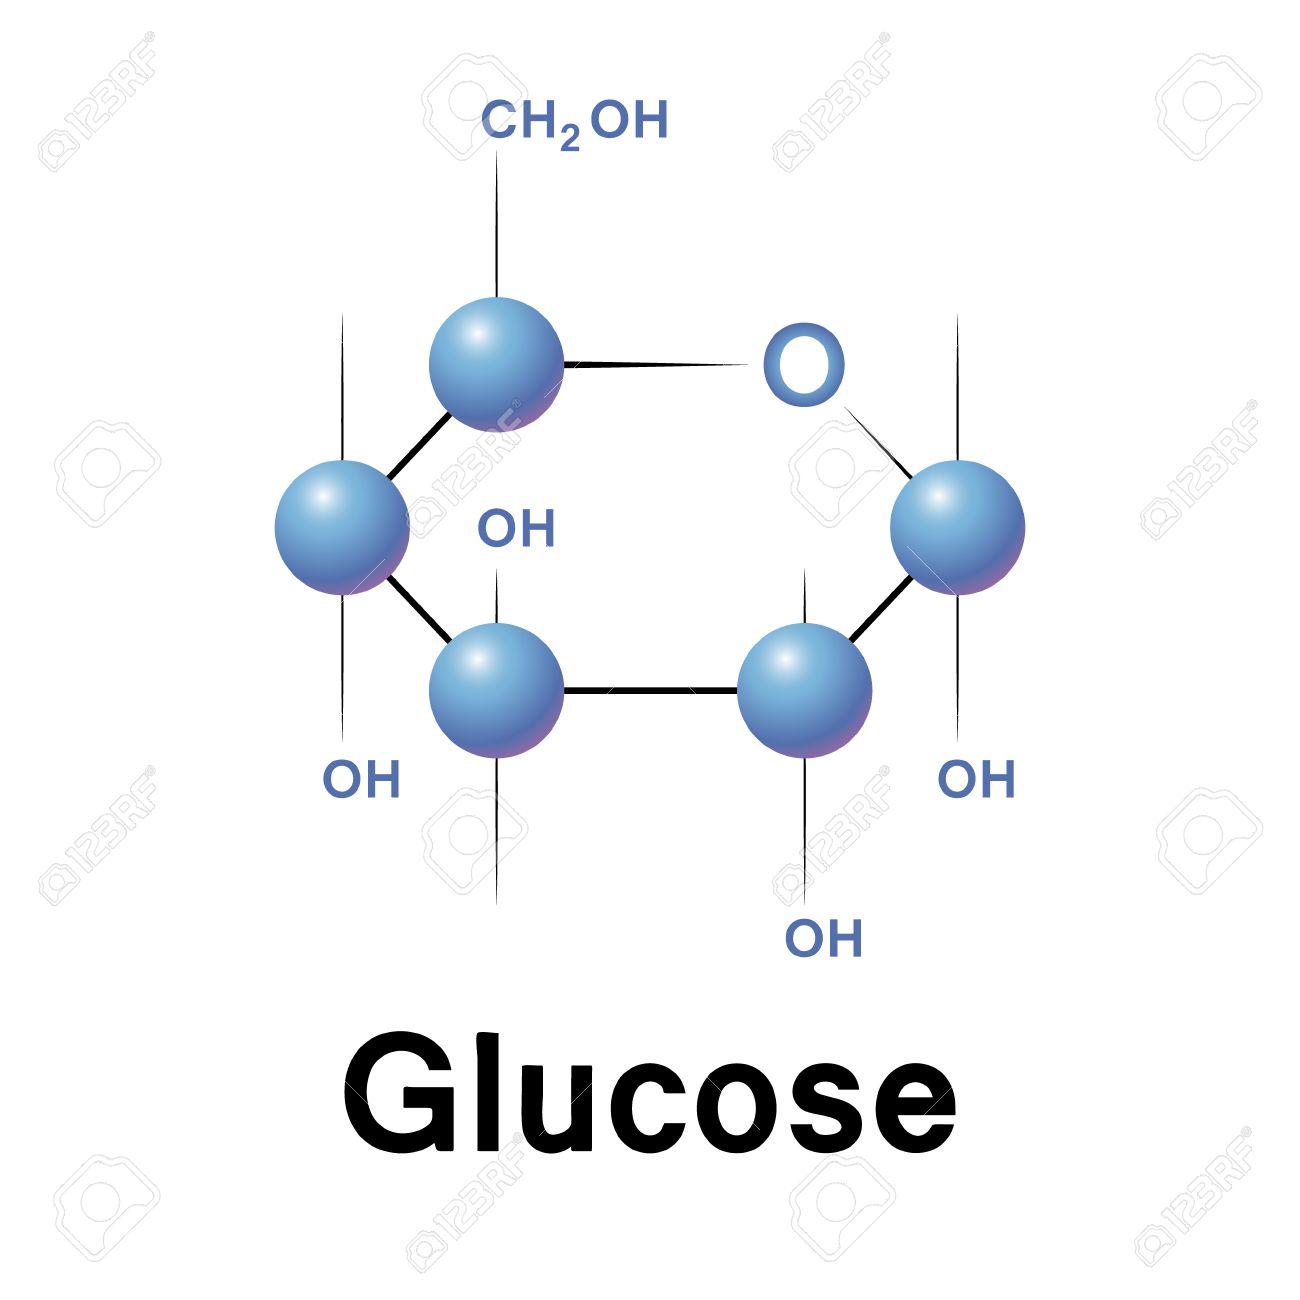 Glucose molecule strucure biochemistry chemistry vector glucose molecule strucure biochemistry chemistry vector illustration stock vector 27871862 biocorpaavc Images